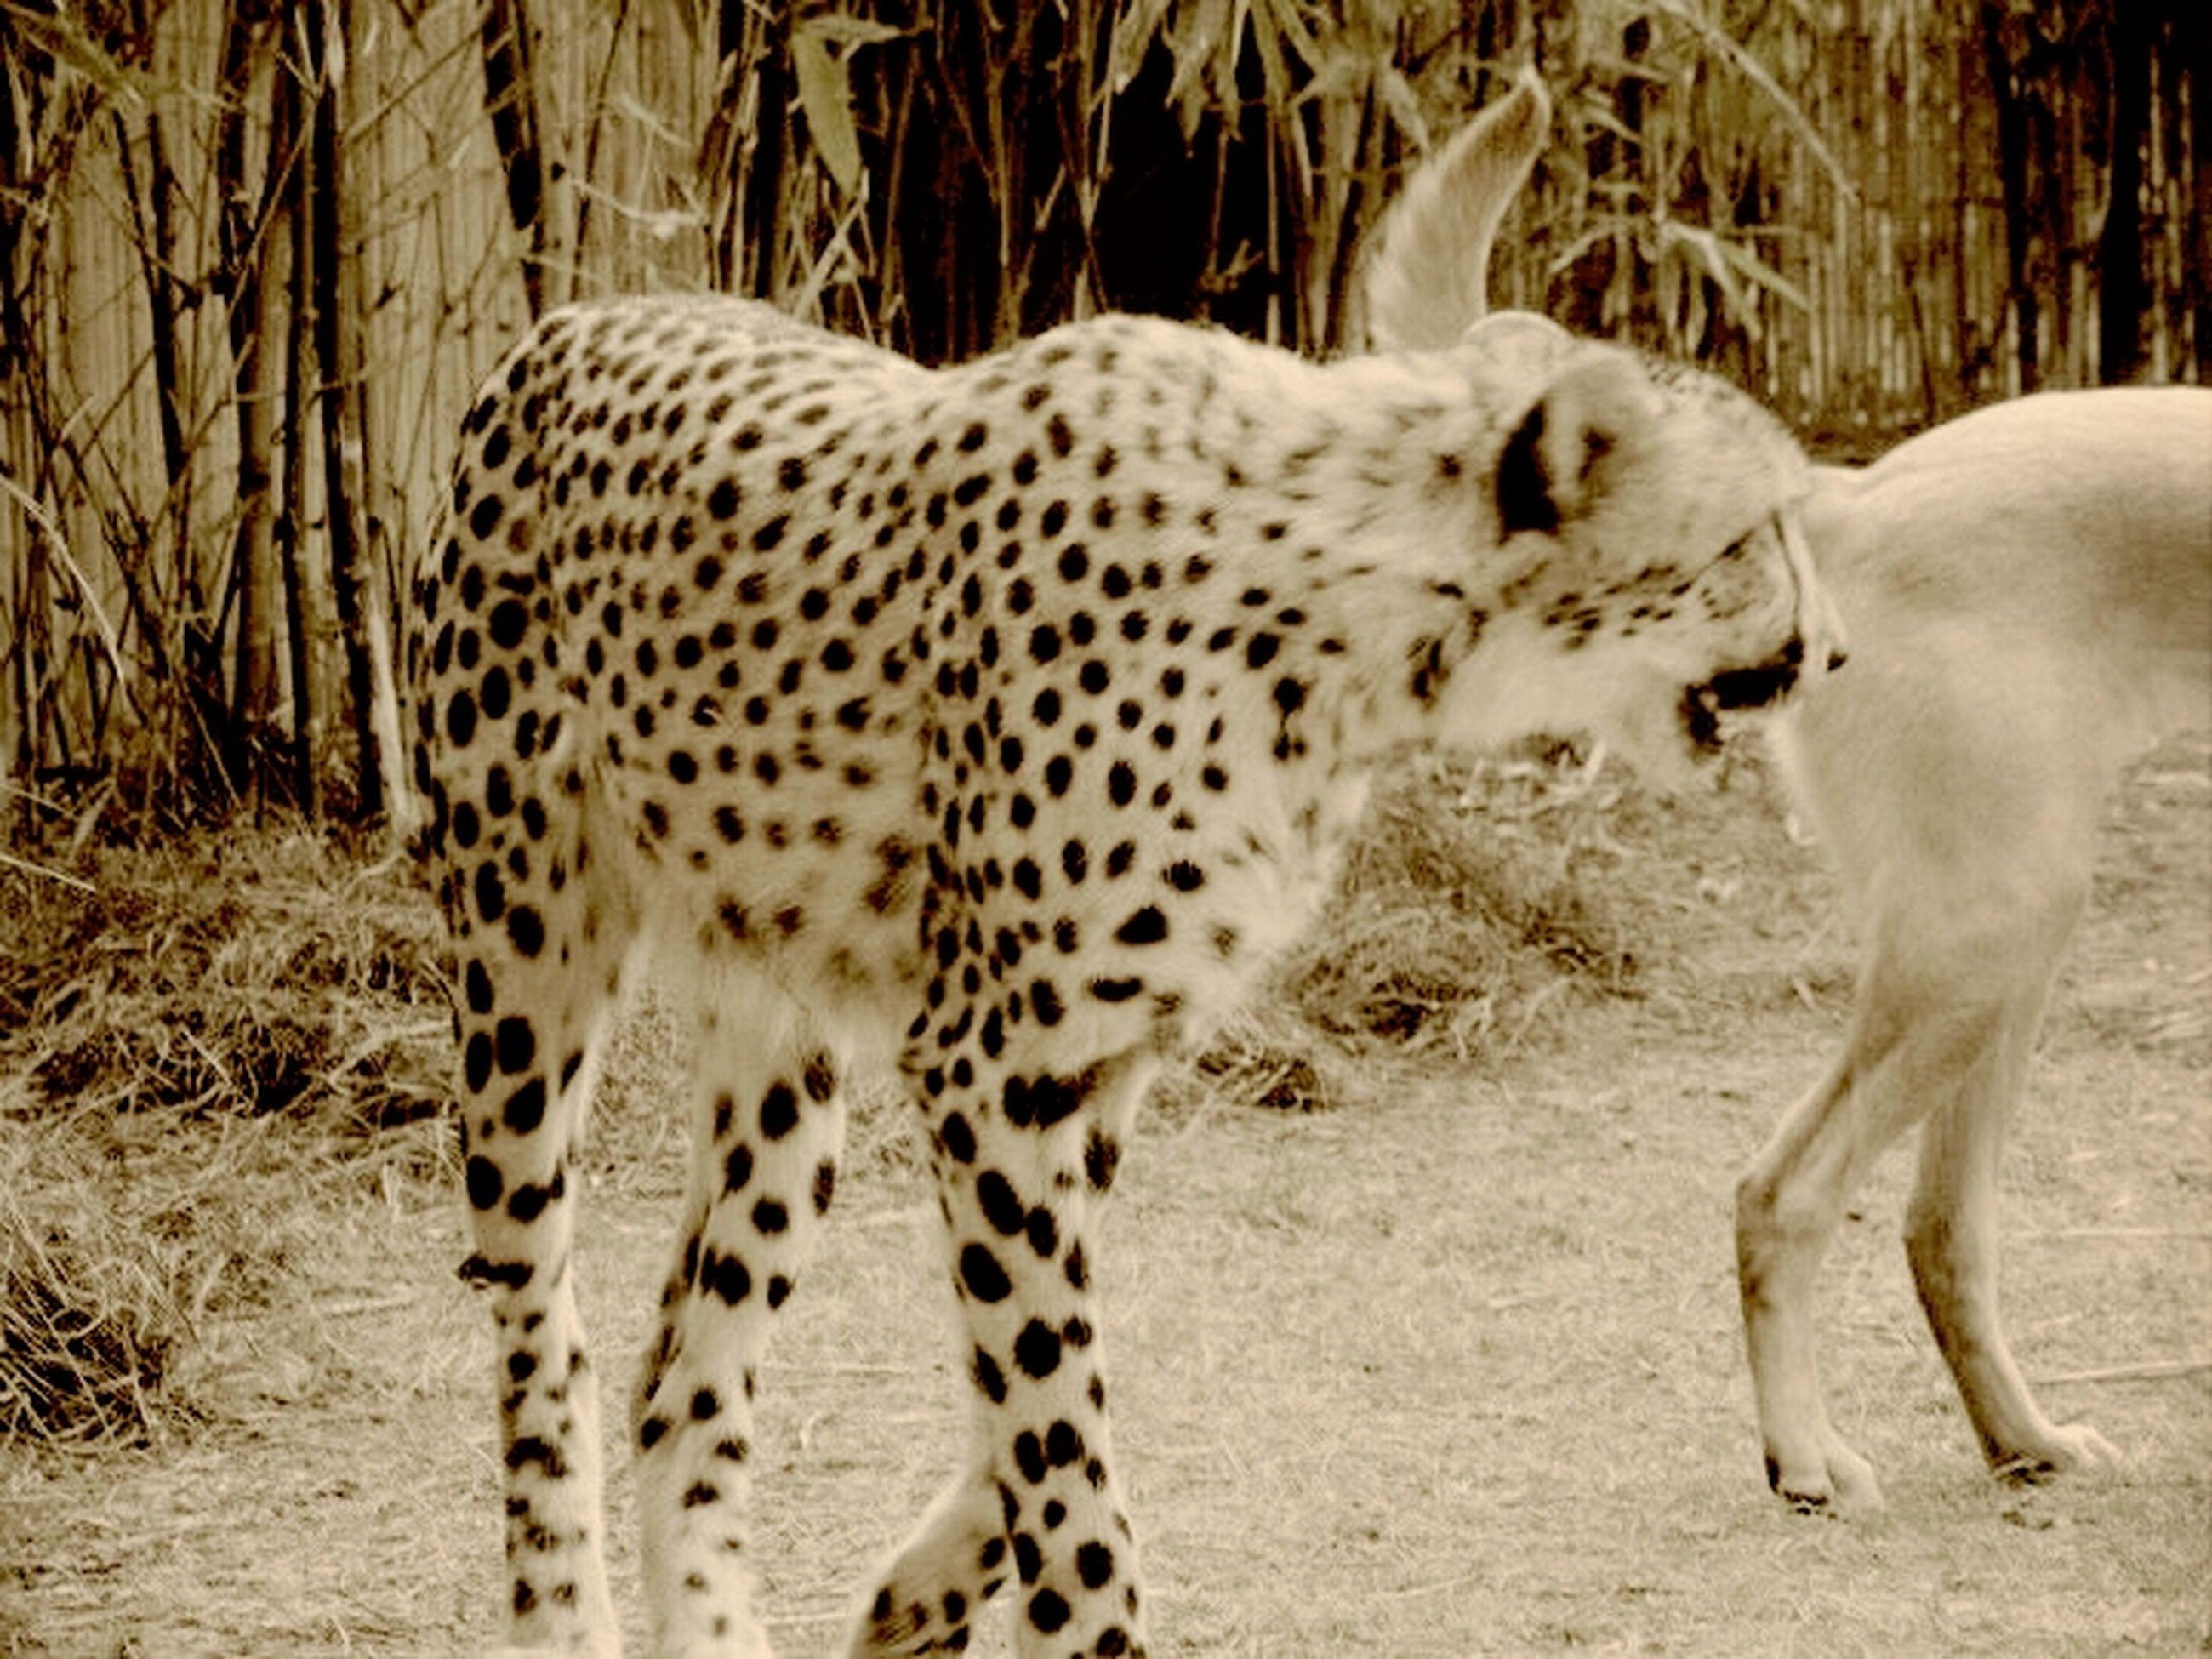 animal themes, mammal, animals in the wild, safari animals, one animal, wildlife, standing, herbivorous, animal markings, forest, zoo, field, two animals, giraffe, zoology, side view, leopard, big cat, zebra, day